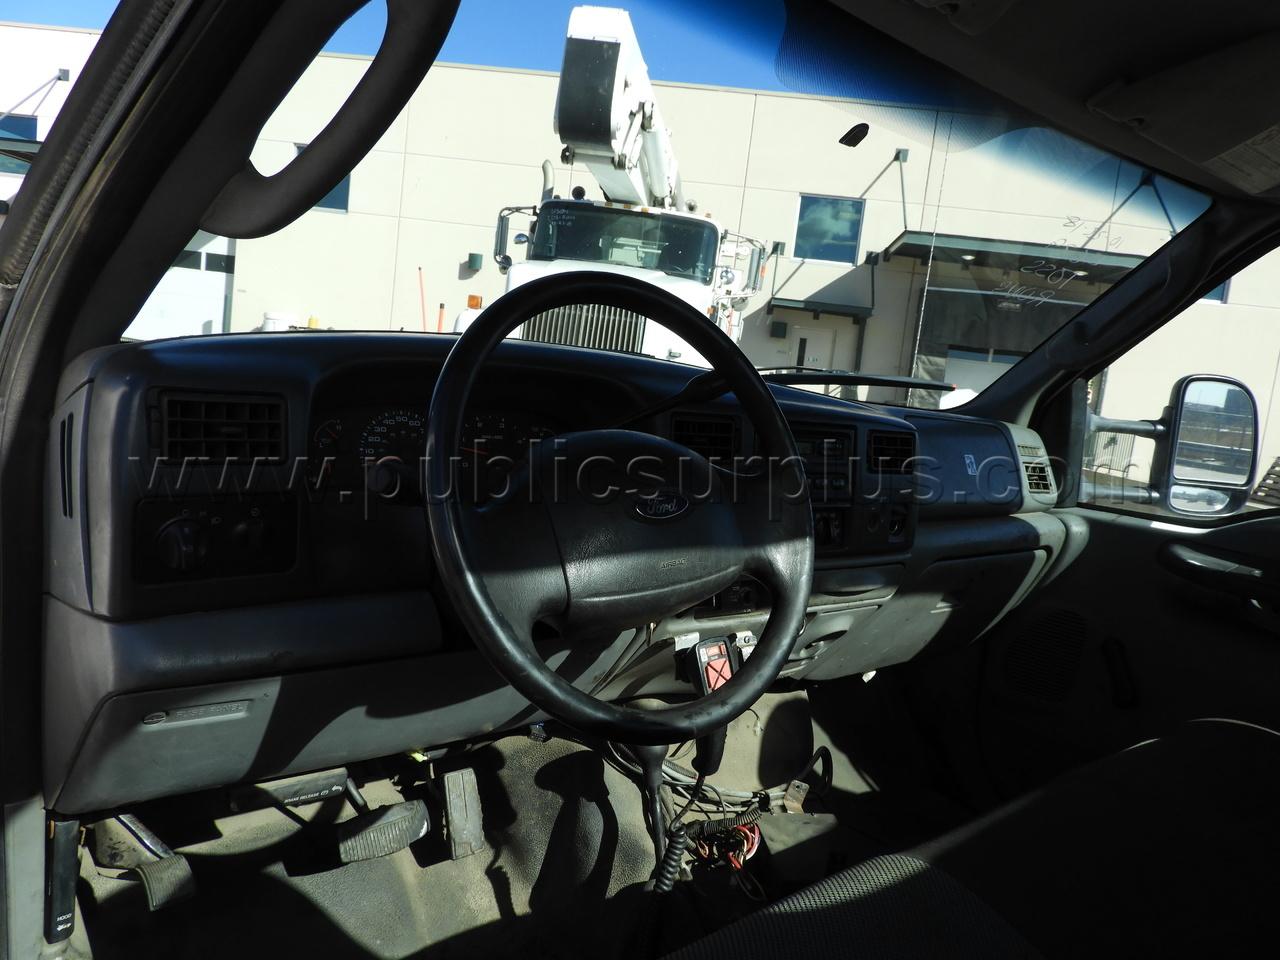 #2220541 - 2004 Ford F-550 XL SD Regular Cab & Chasis DRW 4x4 W/Plow & Sander